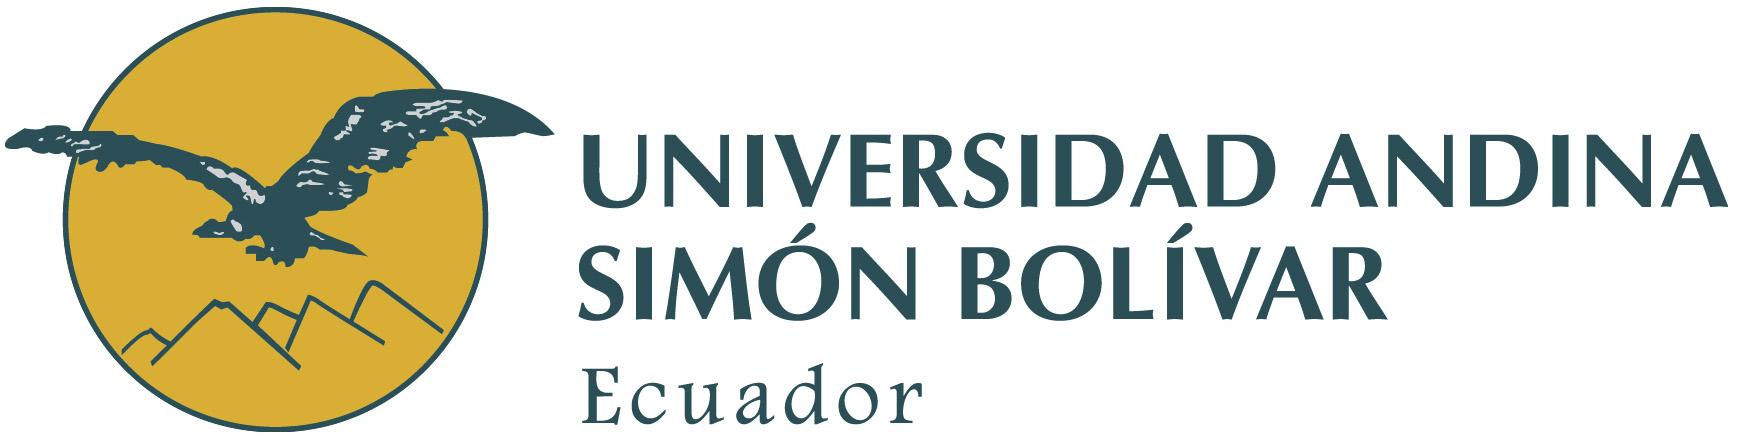 Universidad Andina ALTA.jpg